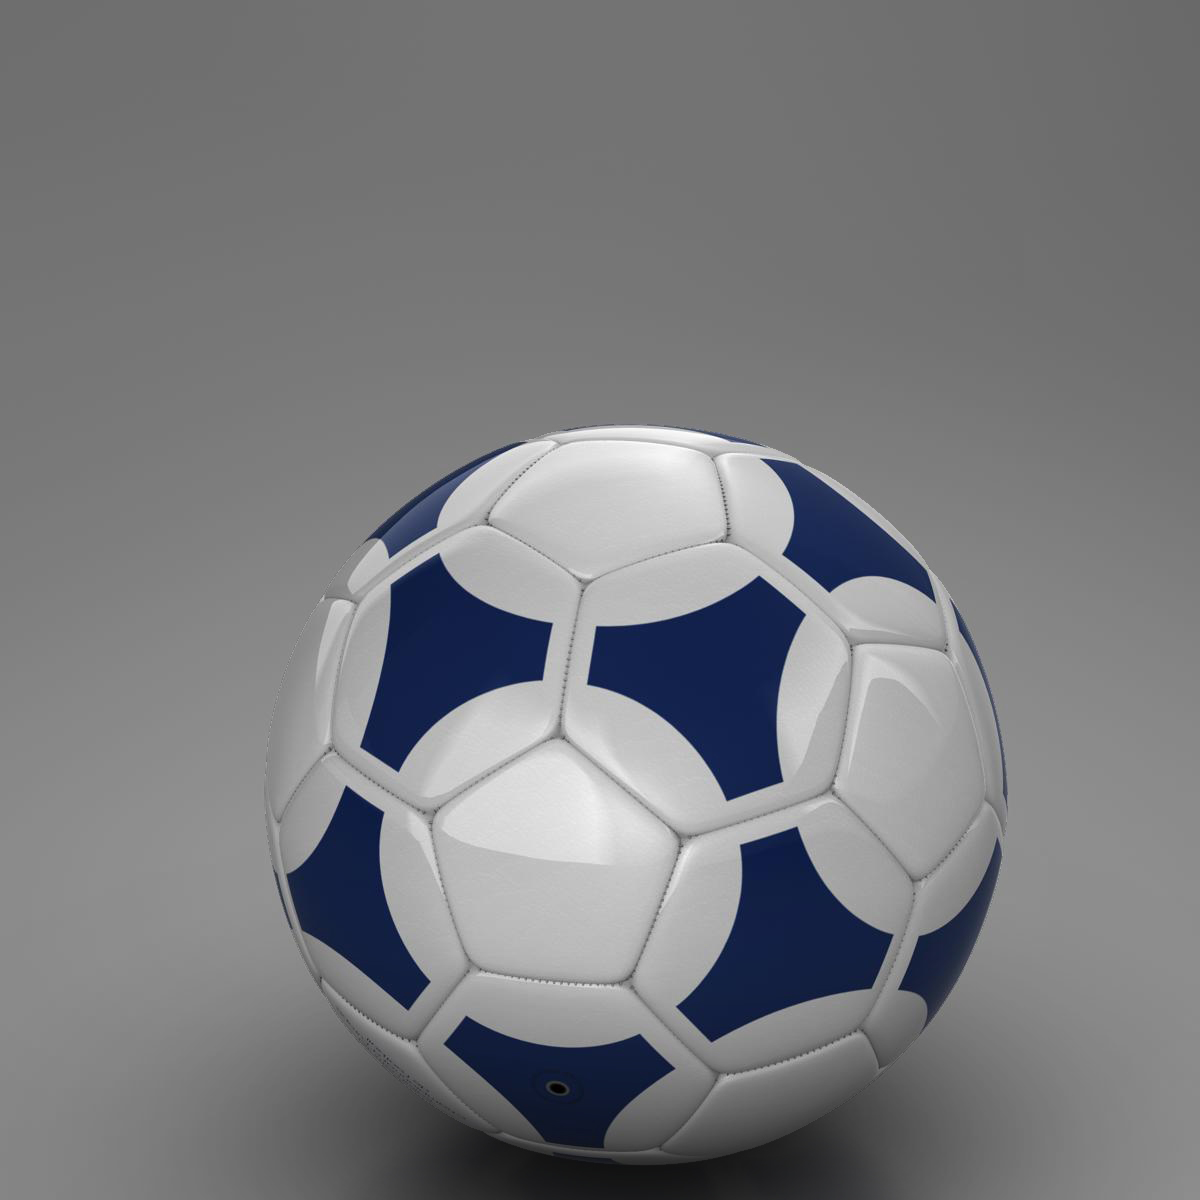 soccerball цэнхэр цагаан 3d загвар 3ds max fbx c4d ma mb obj 203988